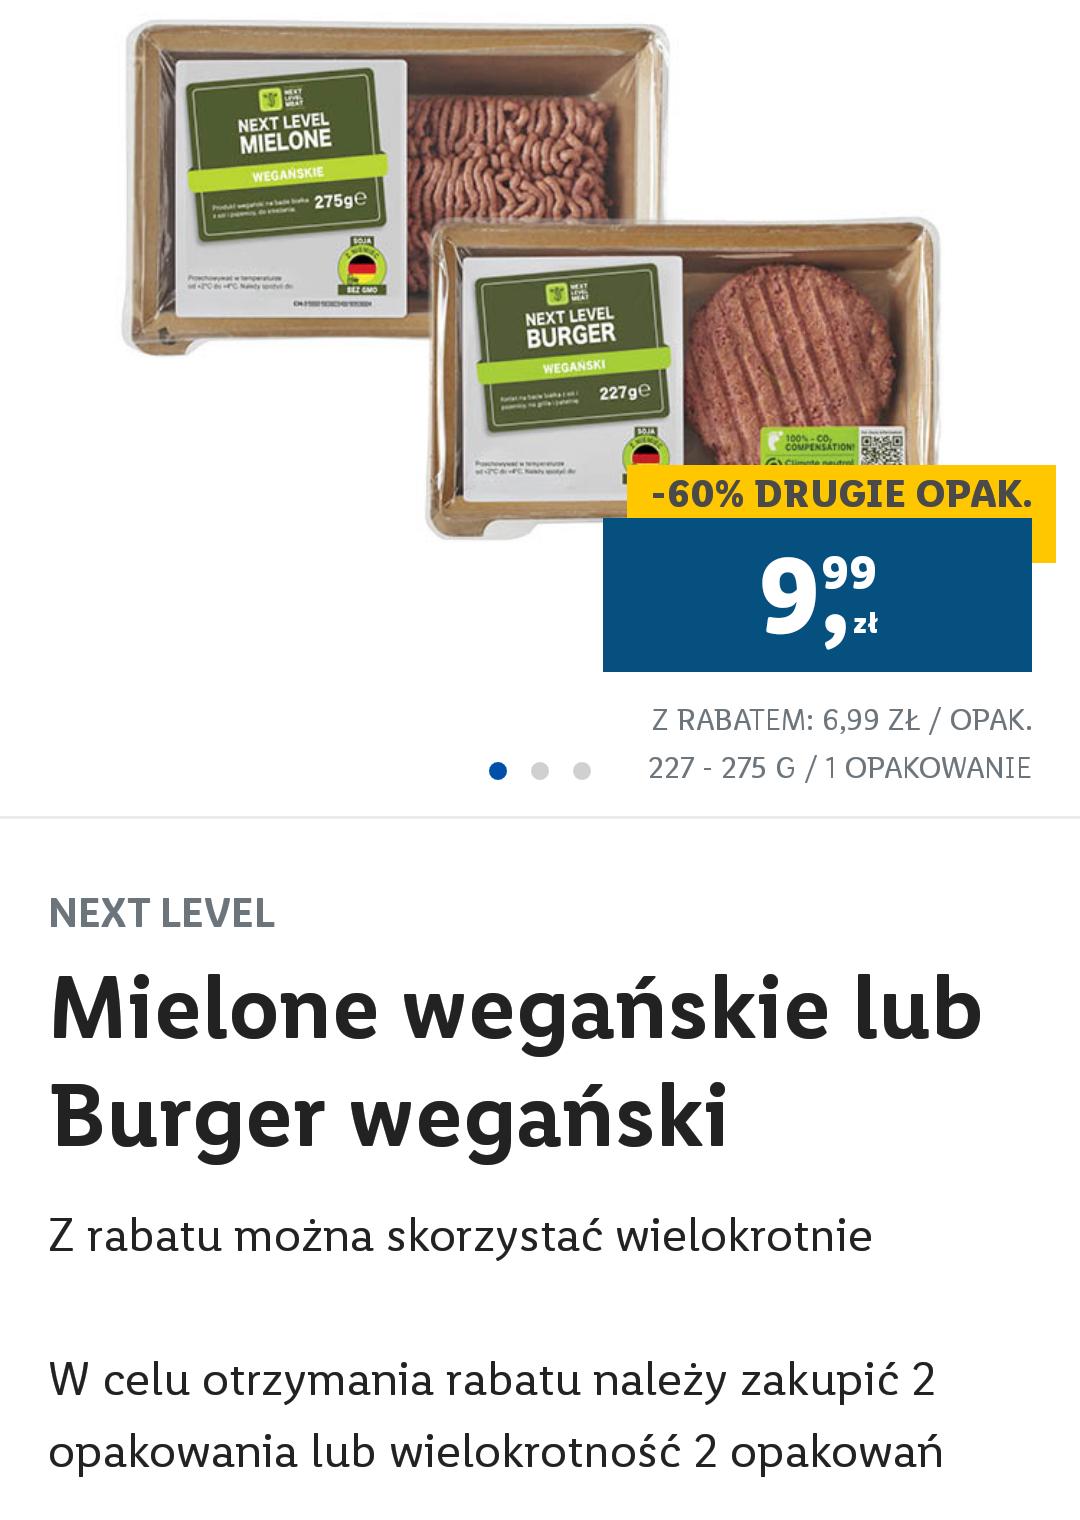 Lidl Plus Mielone wegańskie lub burger wege drugi produkt -60%